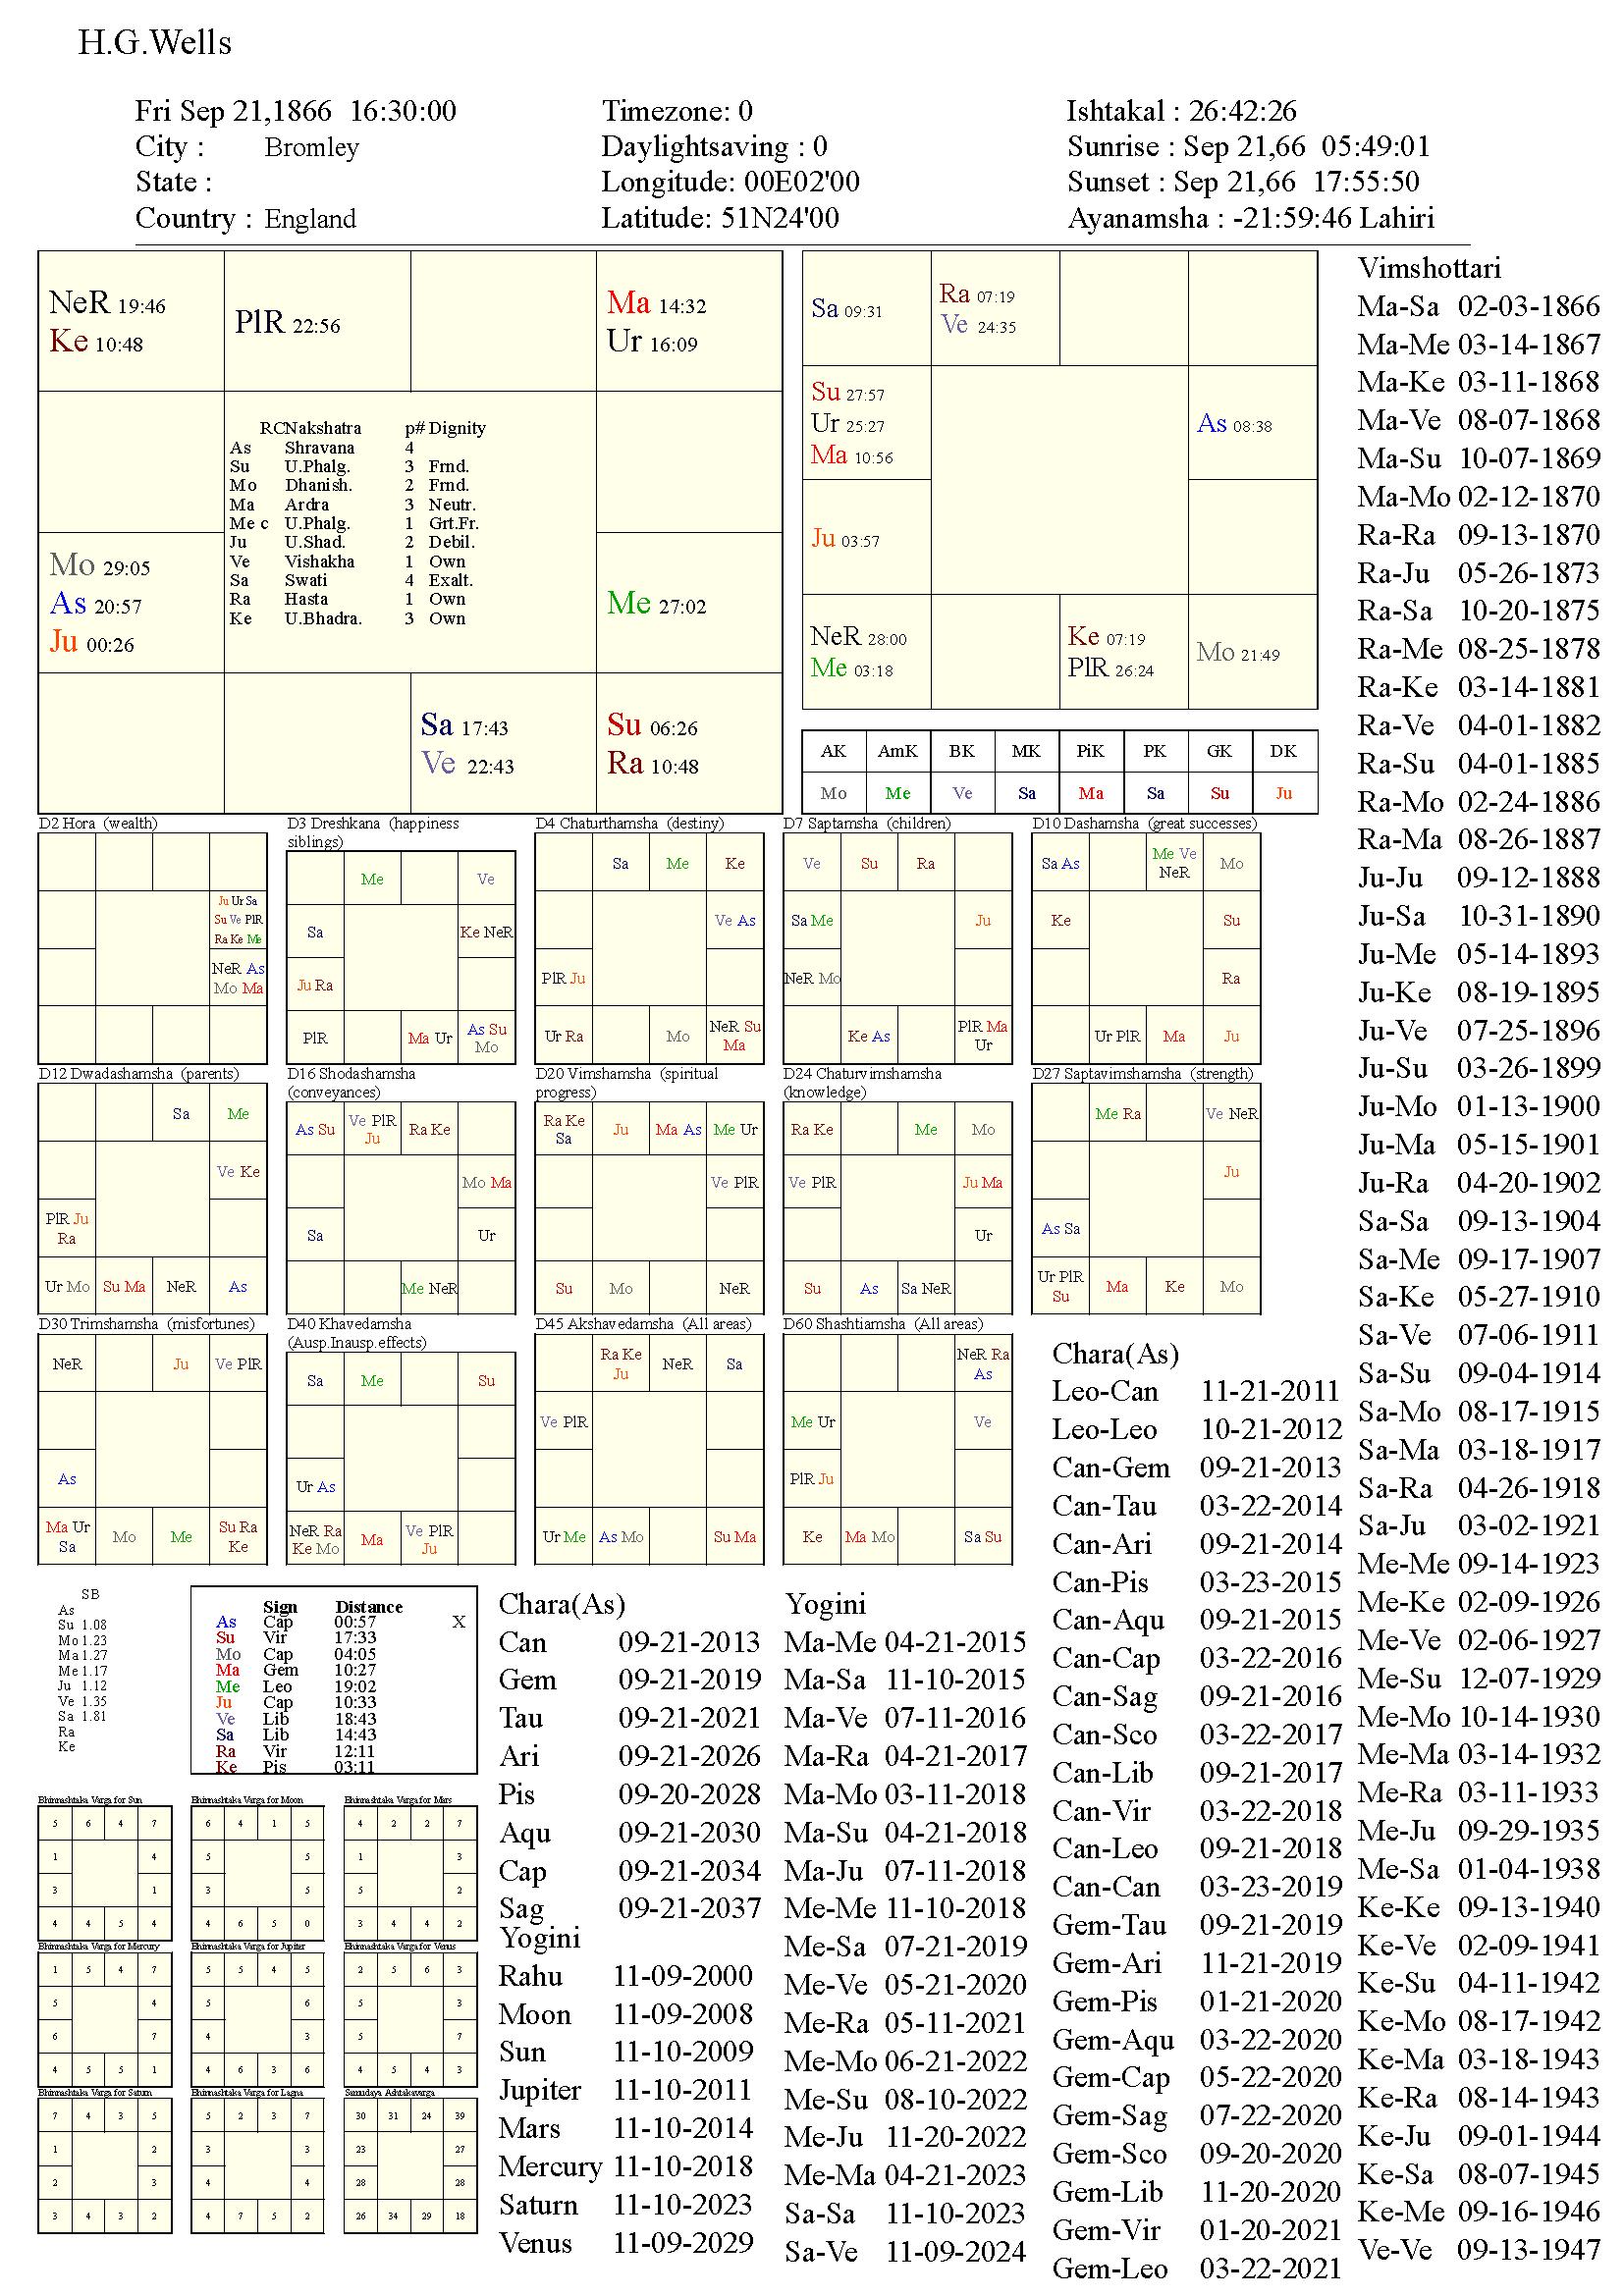 HerbertGeorgeWells_chart